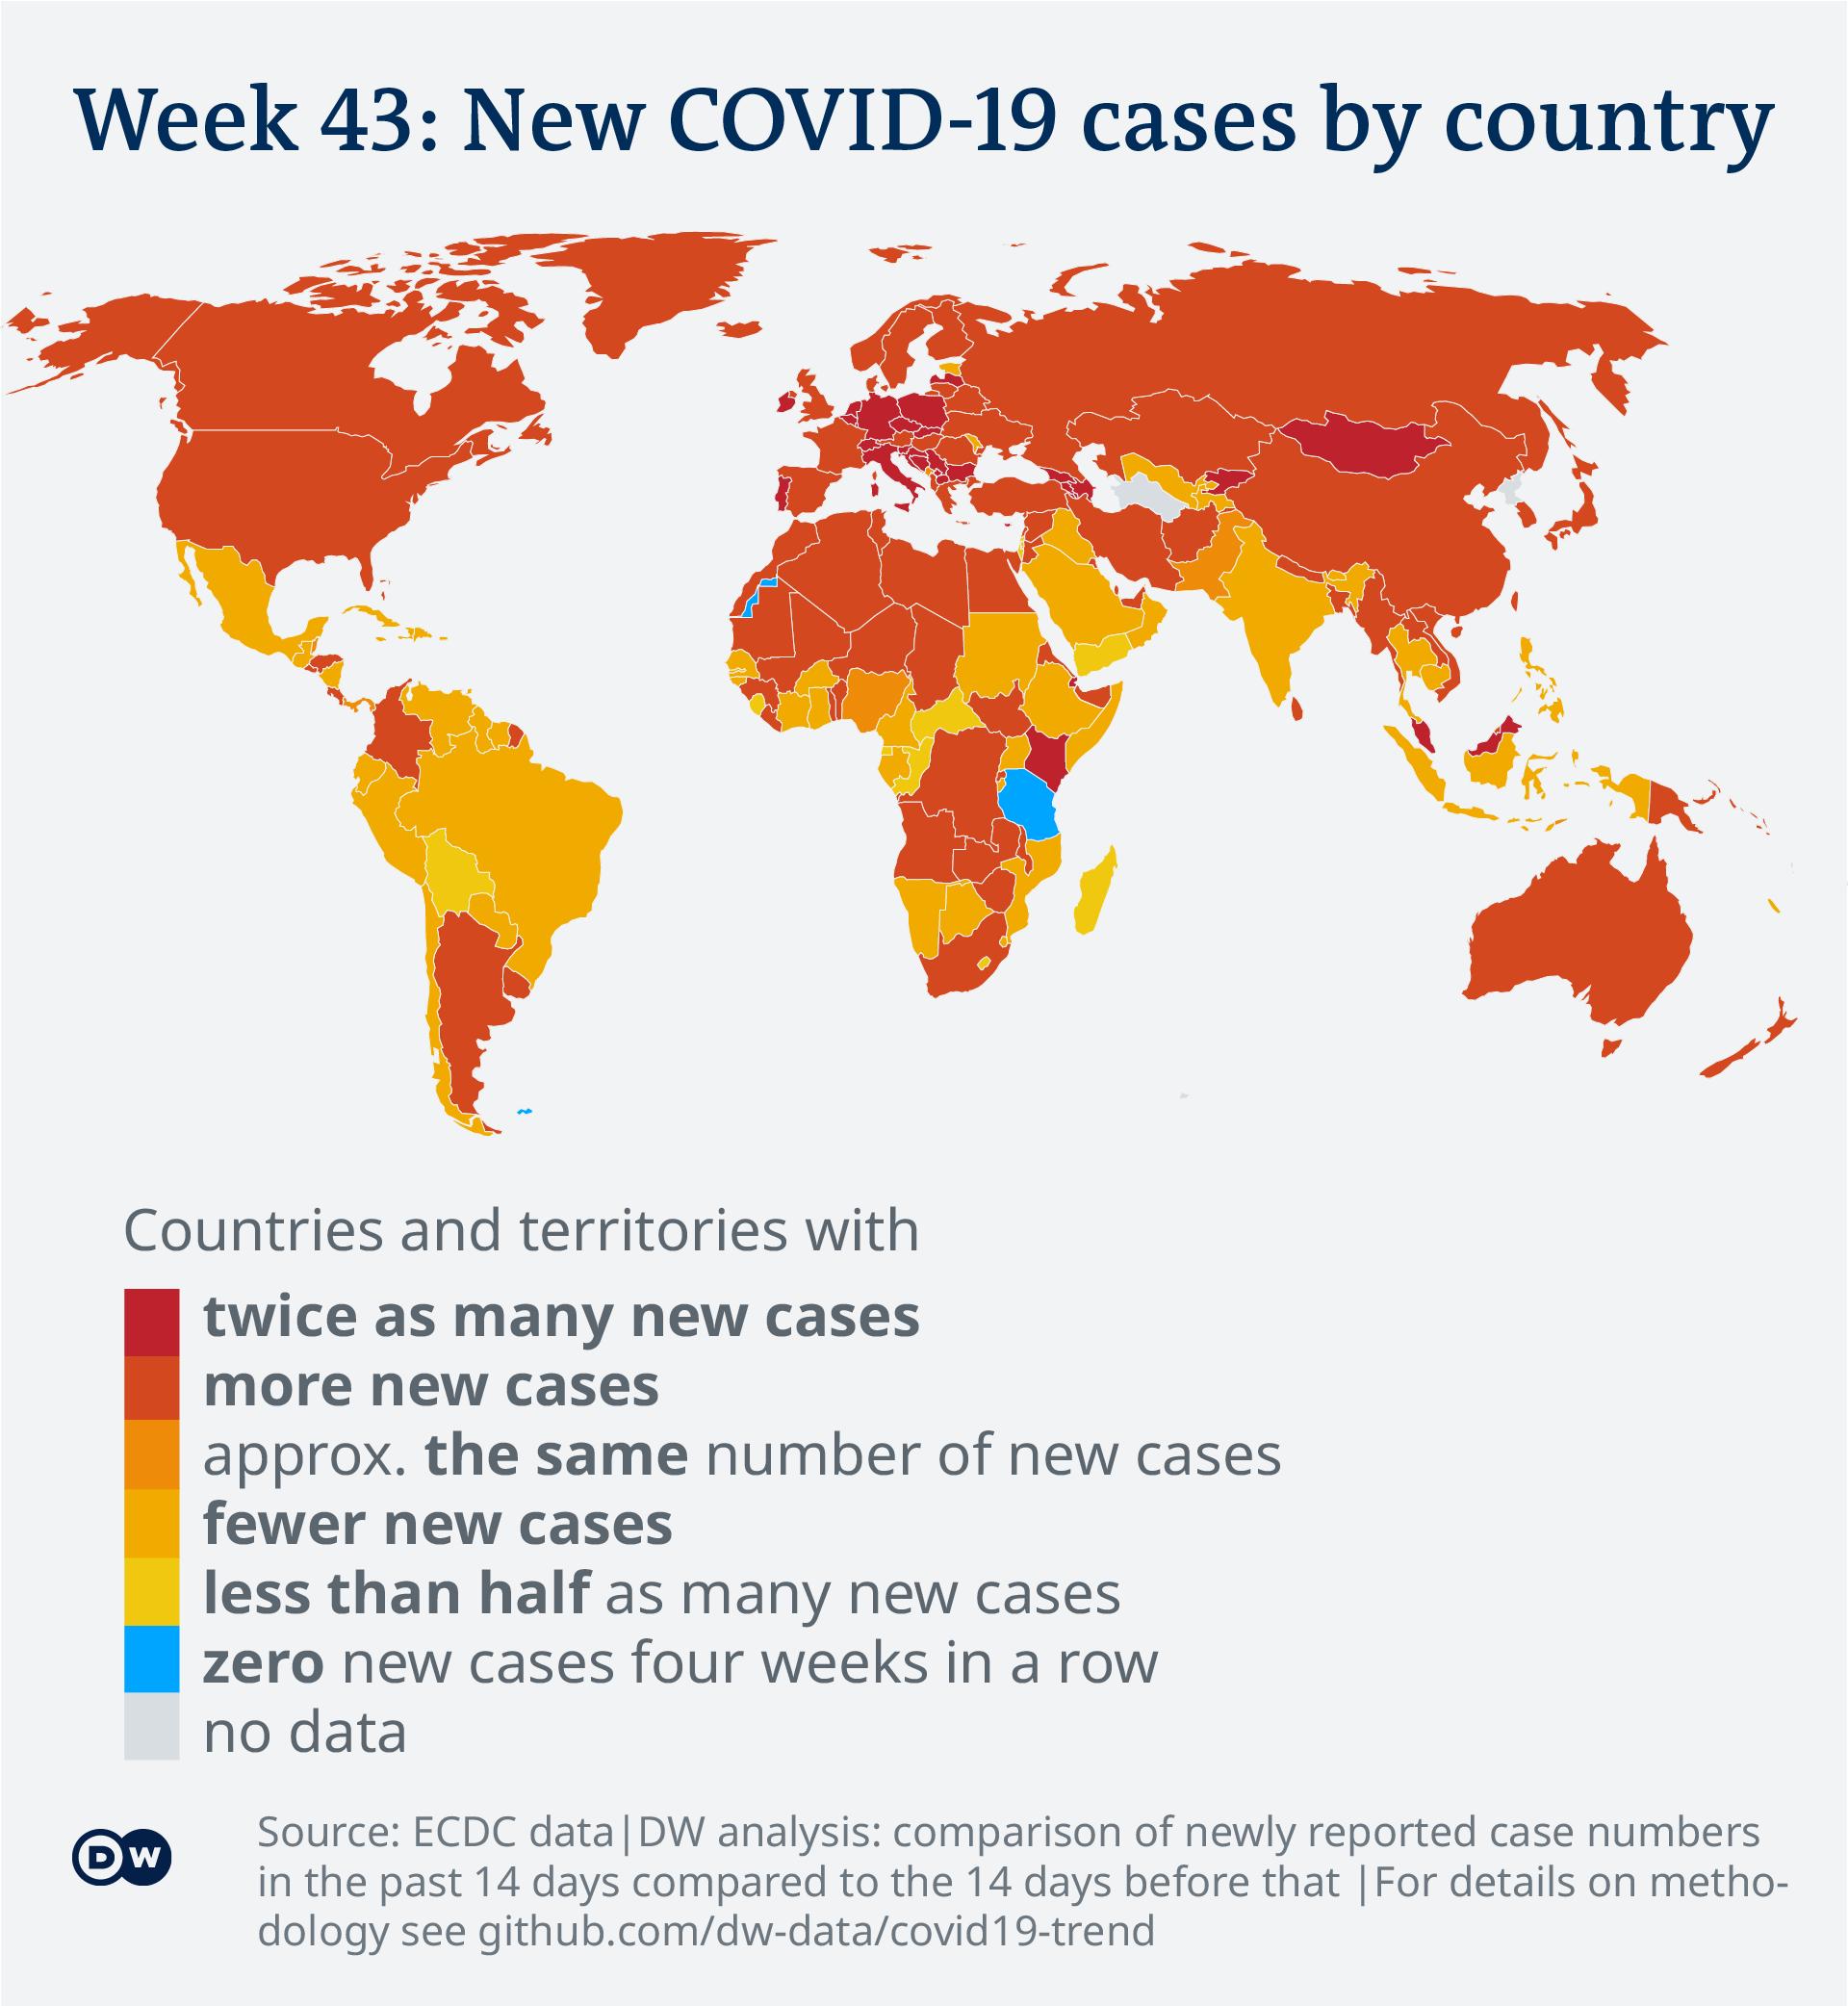 Data visualization: COVID-19 global new case numbers trend - map calendar week 43